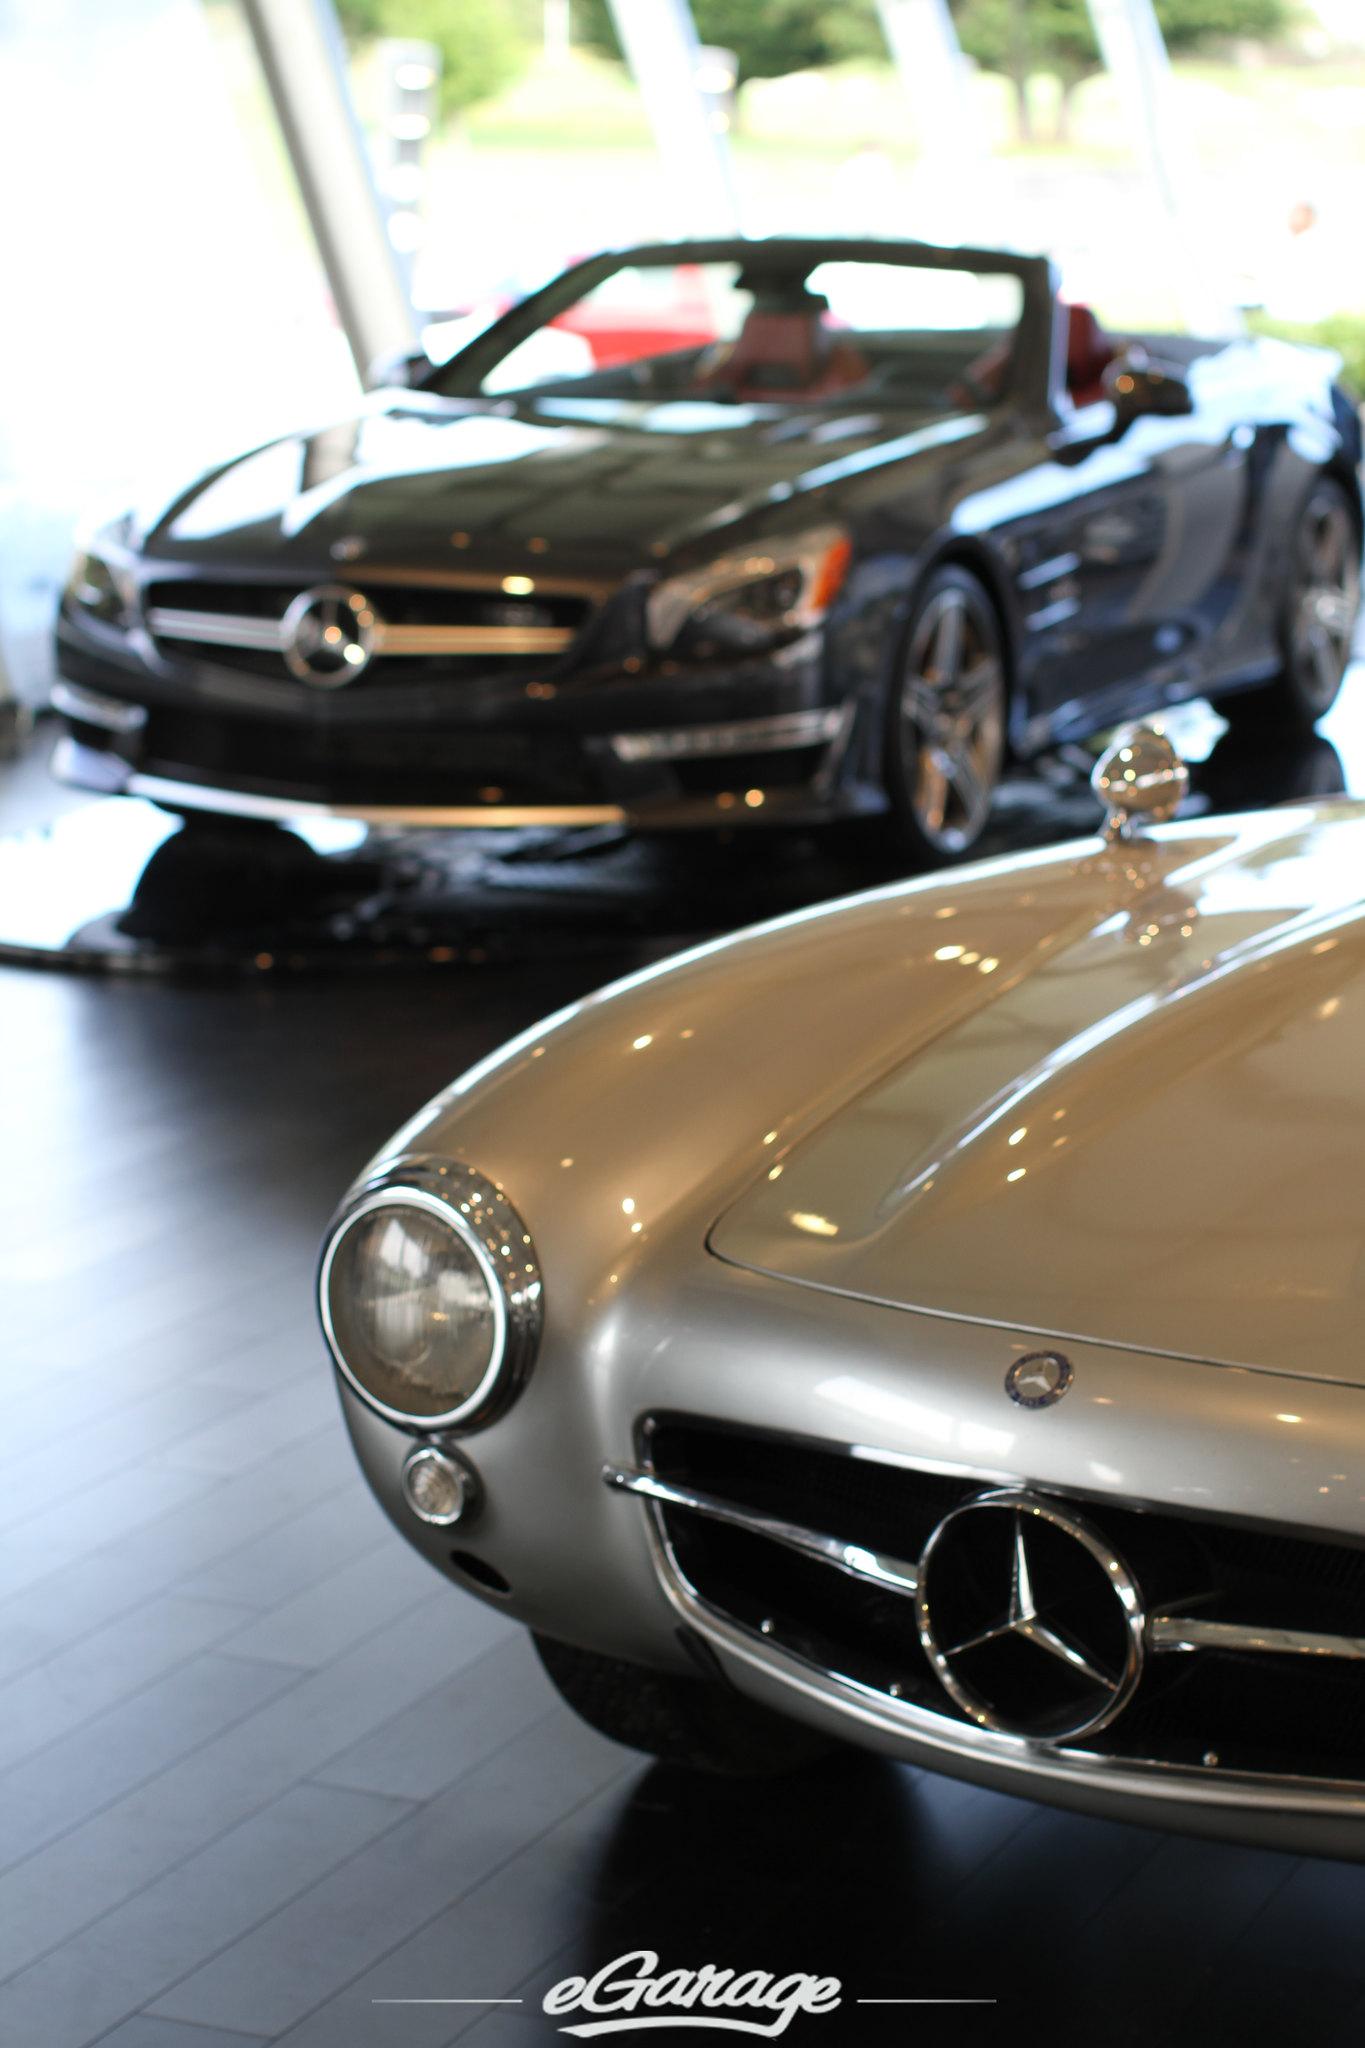 7828746558 3aebaf4b50 k Mercedes Benz Classic